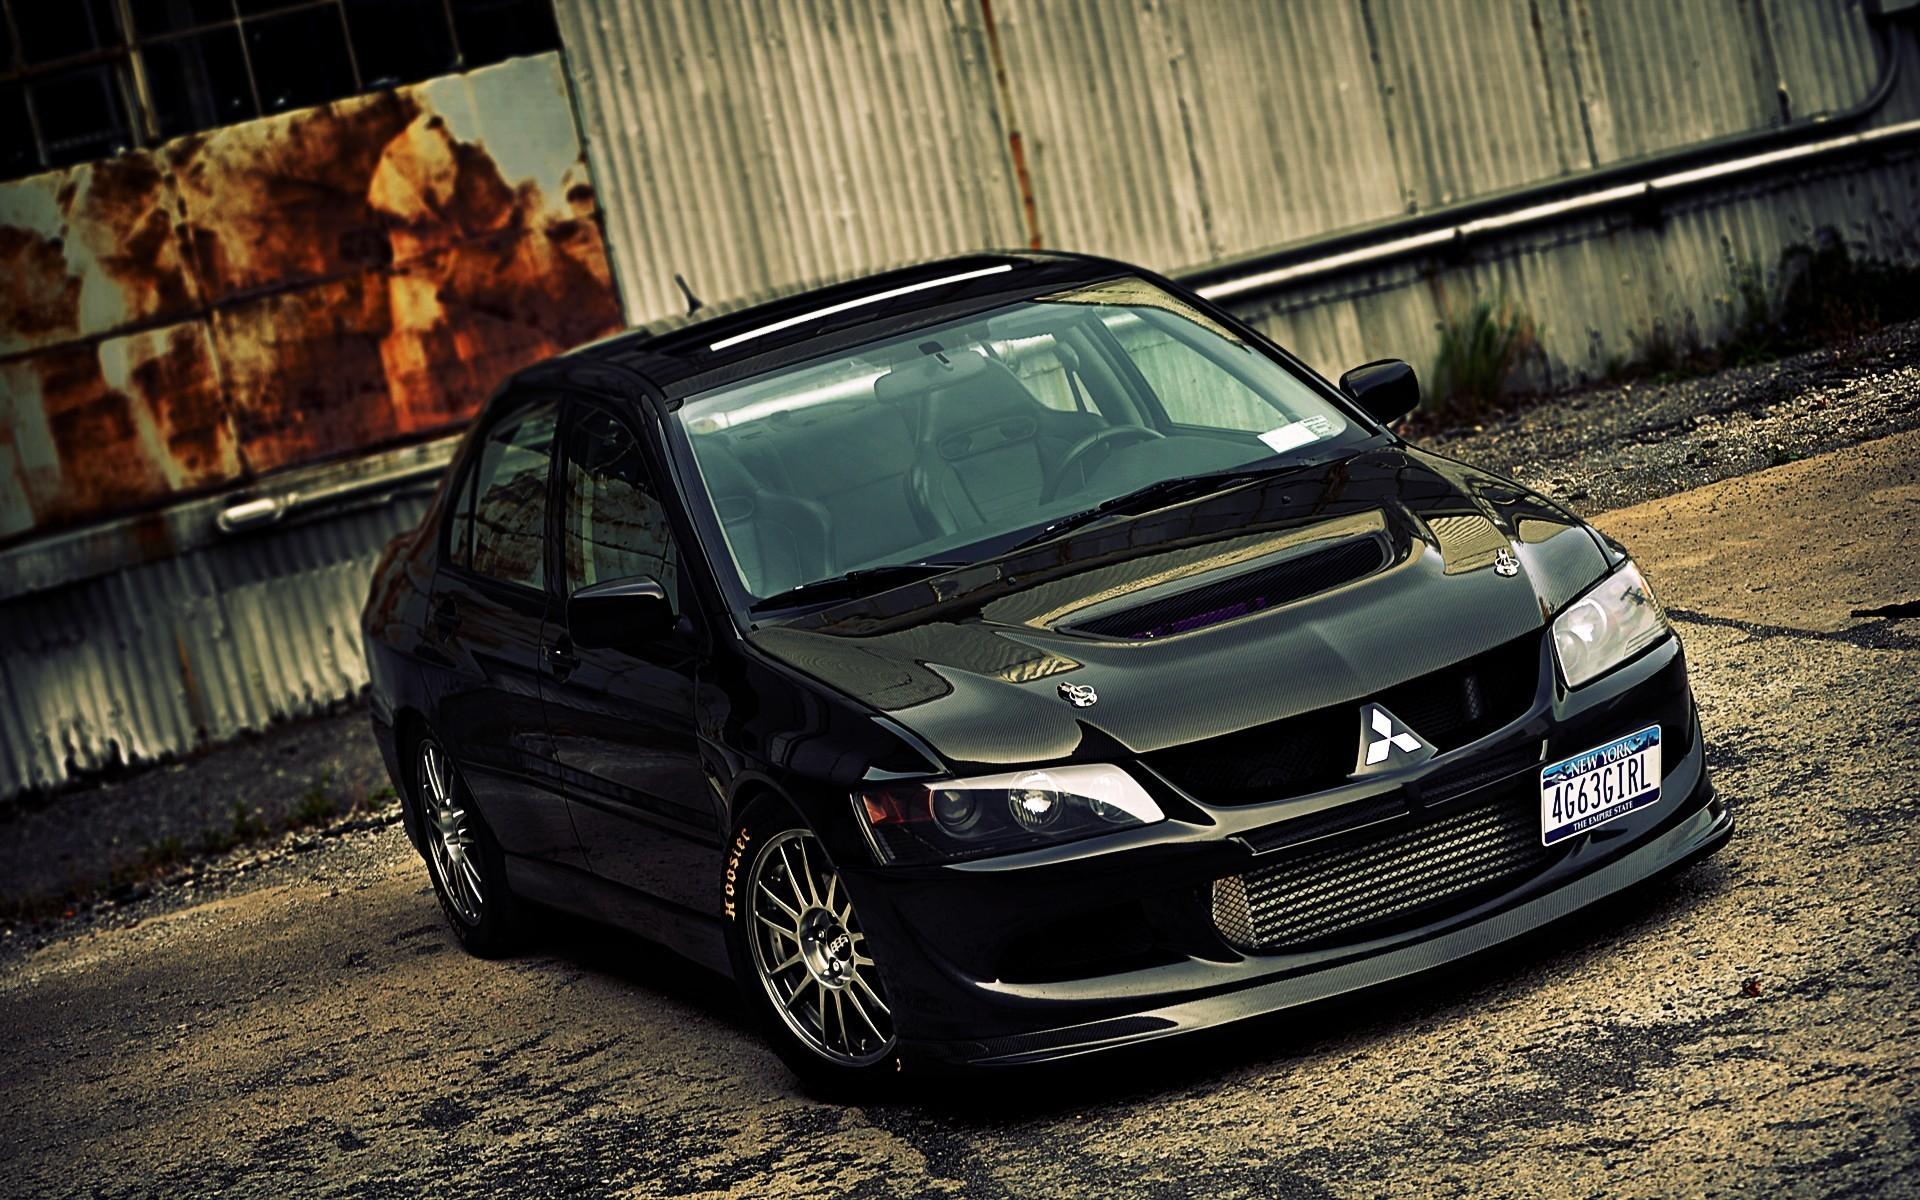 Mitsubishi Evo 9 Wallpaper (69+ images)